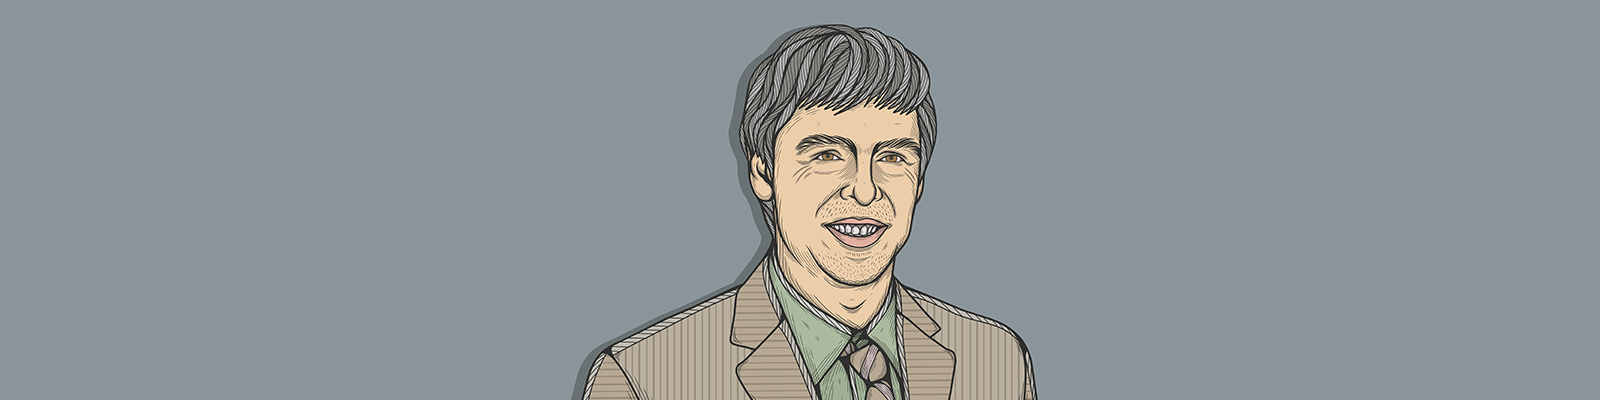 Google のラリー・ペイジと中村天風、共通する成功の教え | DIGIDAY[日本版]